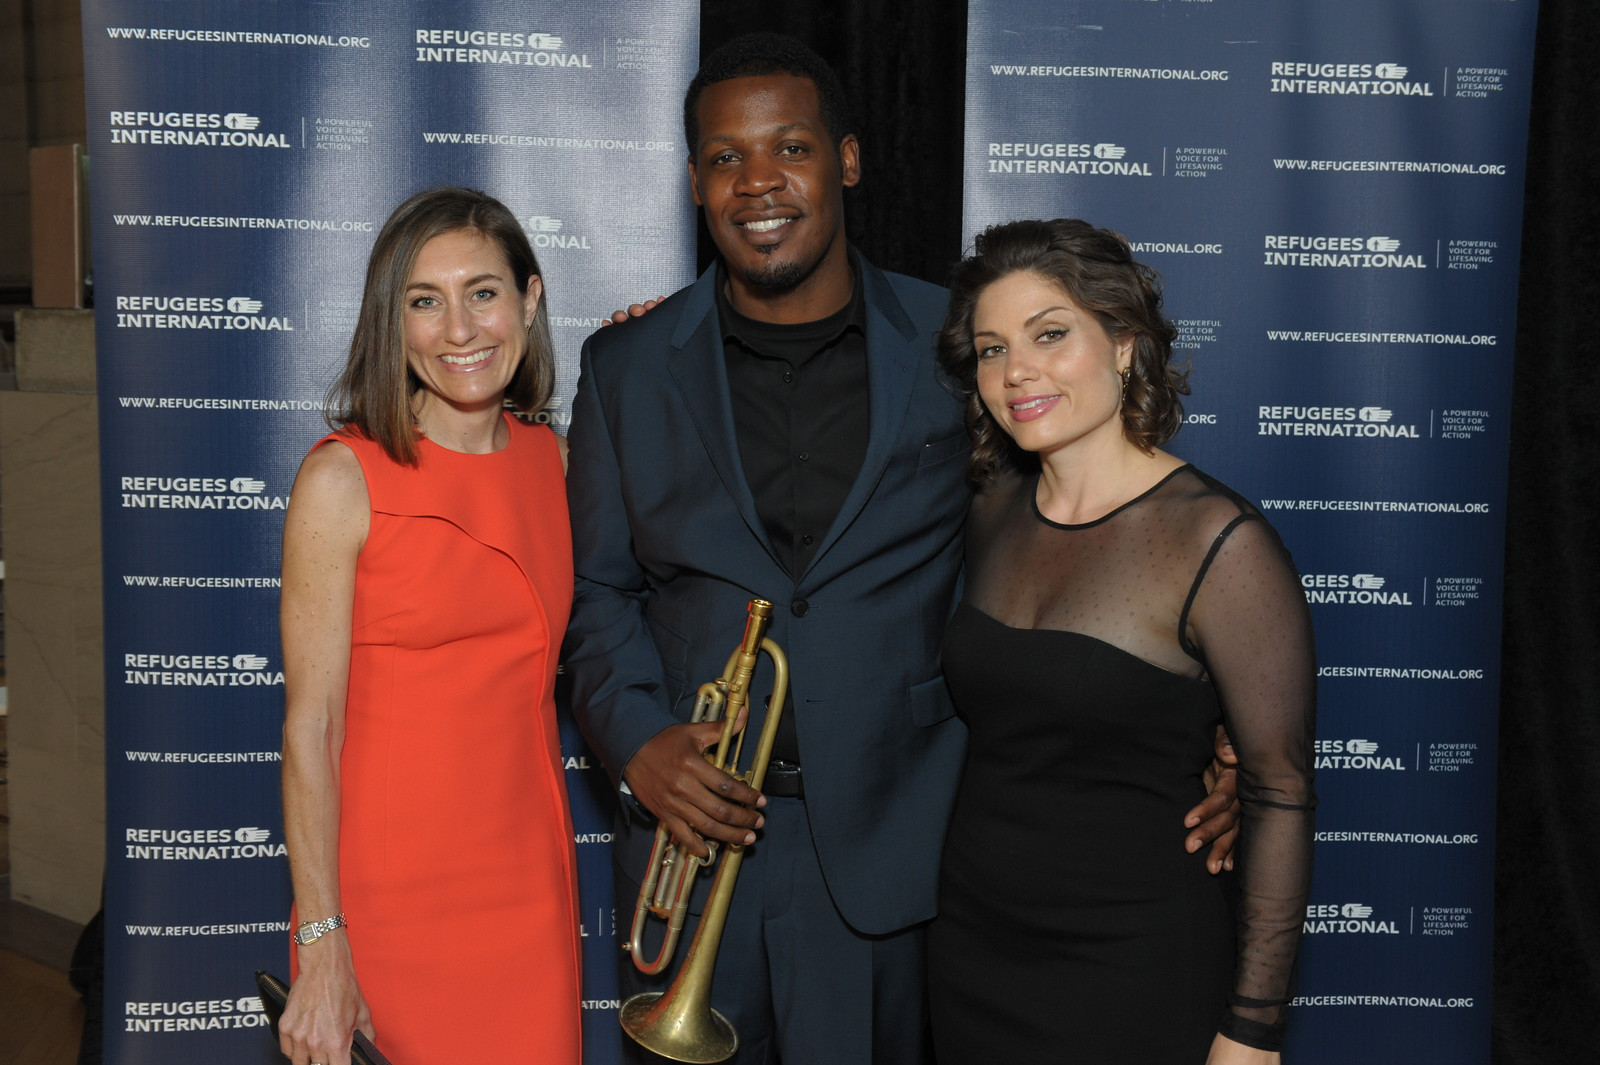 RI Board Member Sarah Bacon, Keyon Harrold, and Andrea Pizziconi.